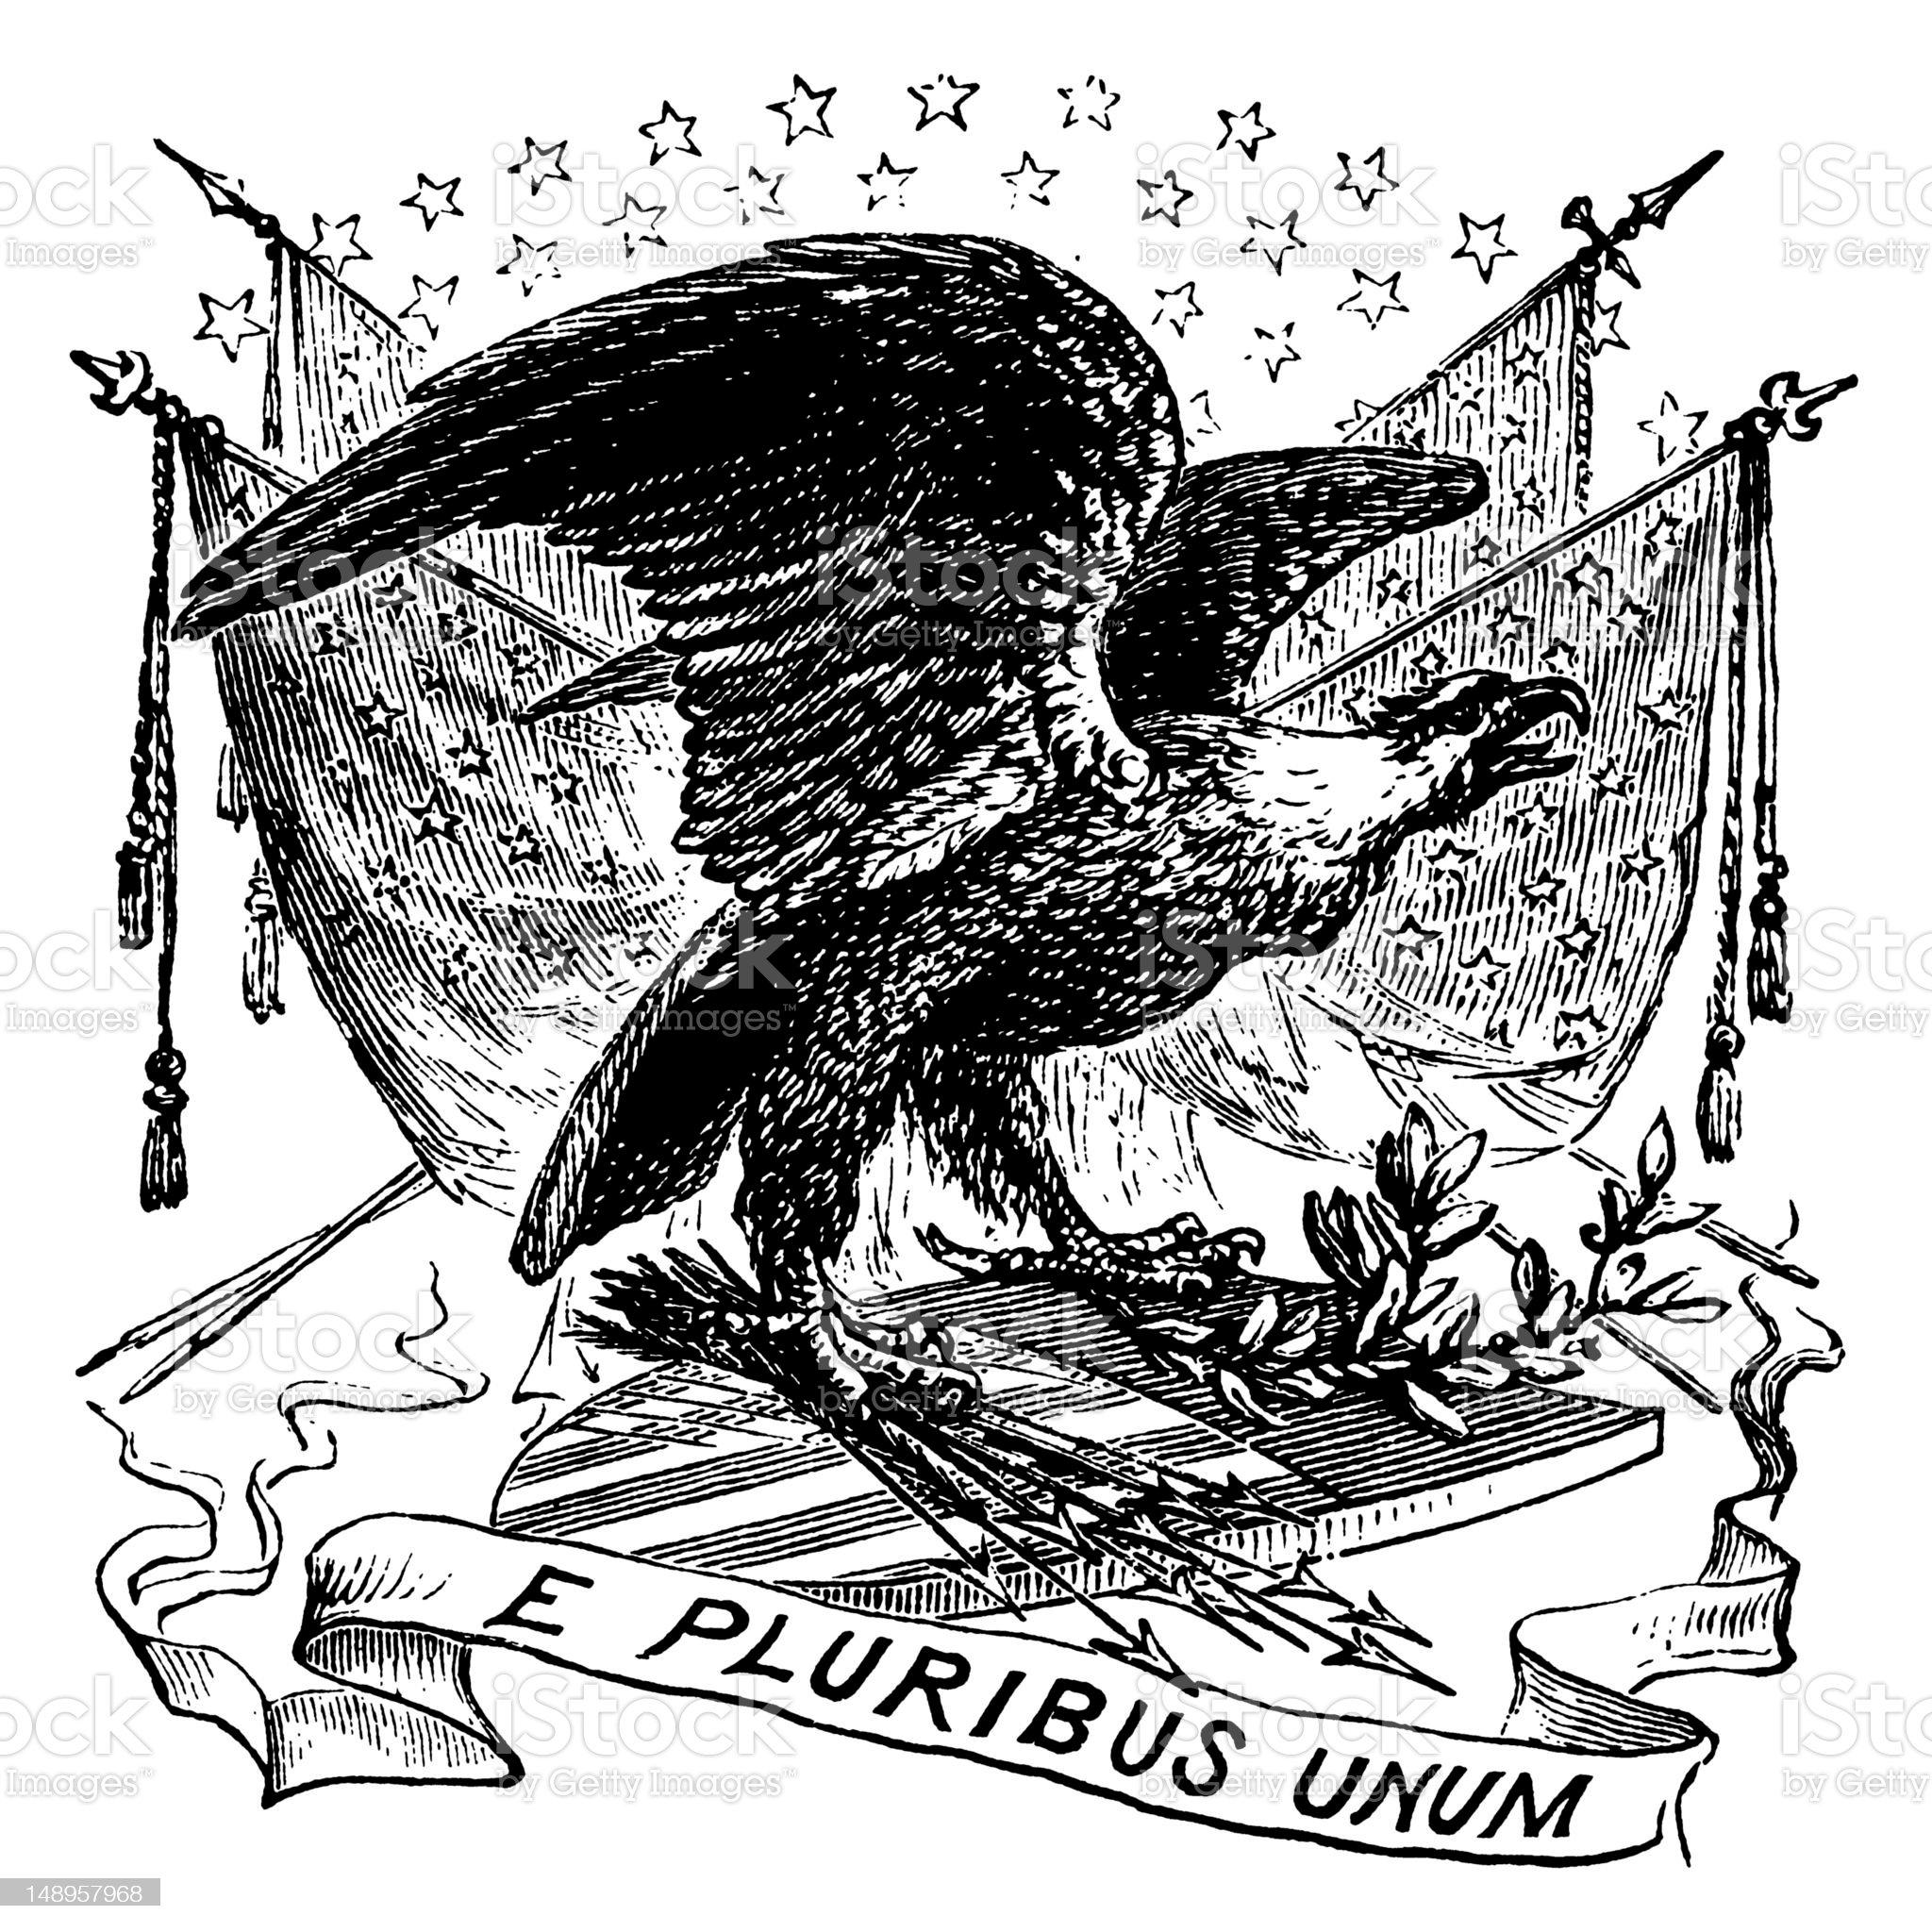 US Patriotic Vignette royalty-free stock vector art